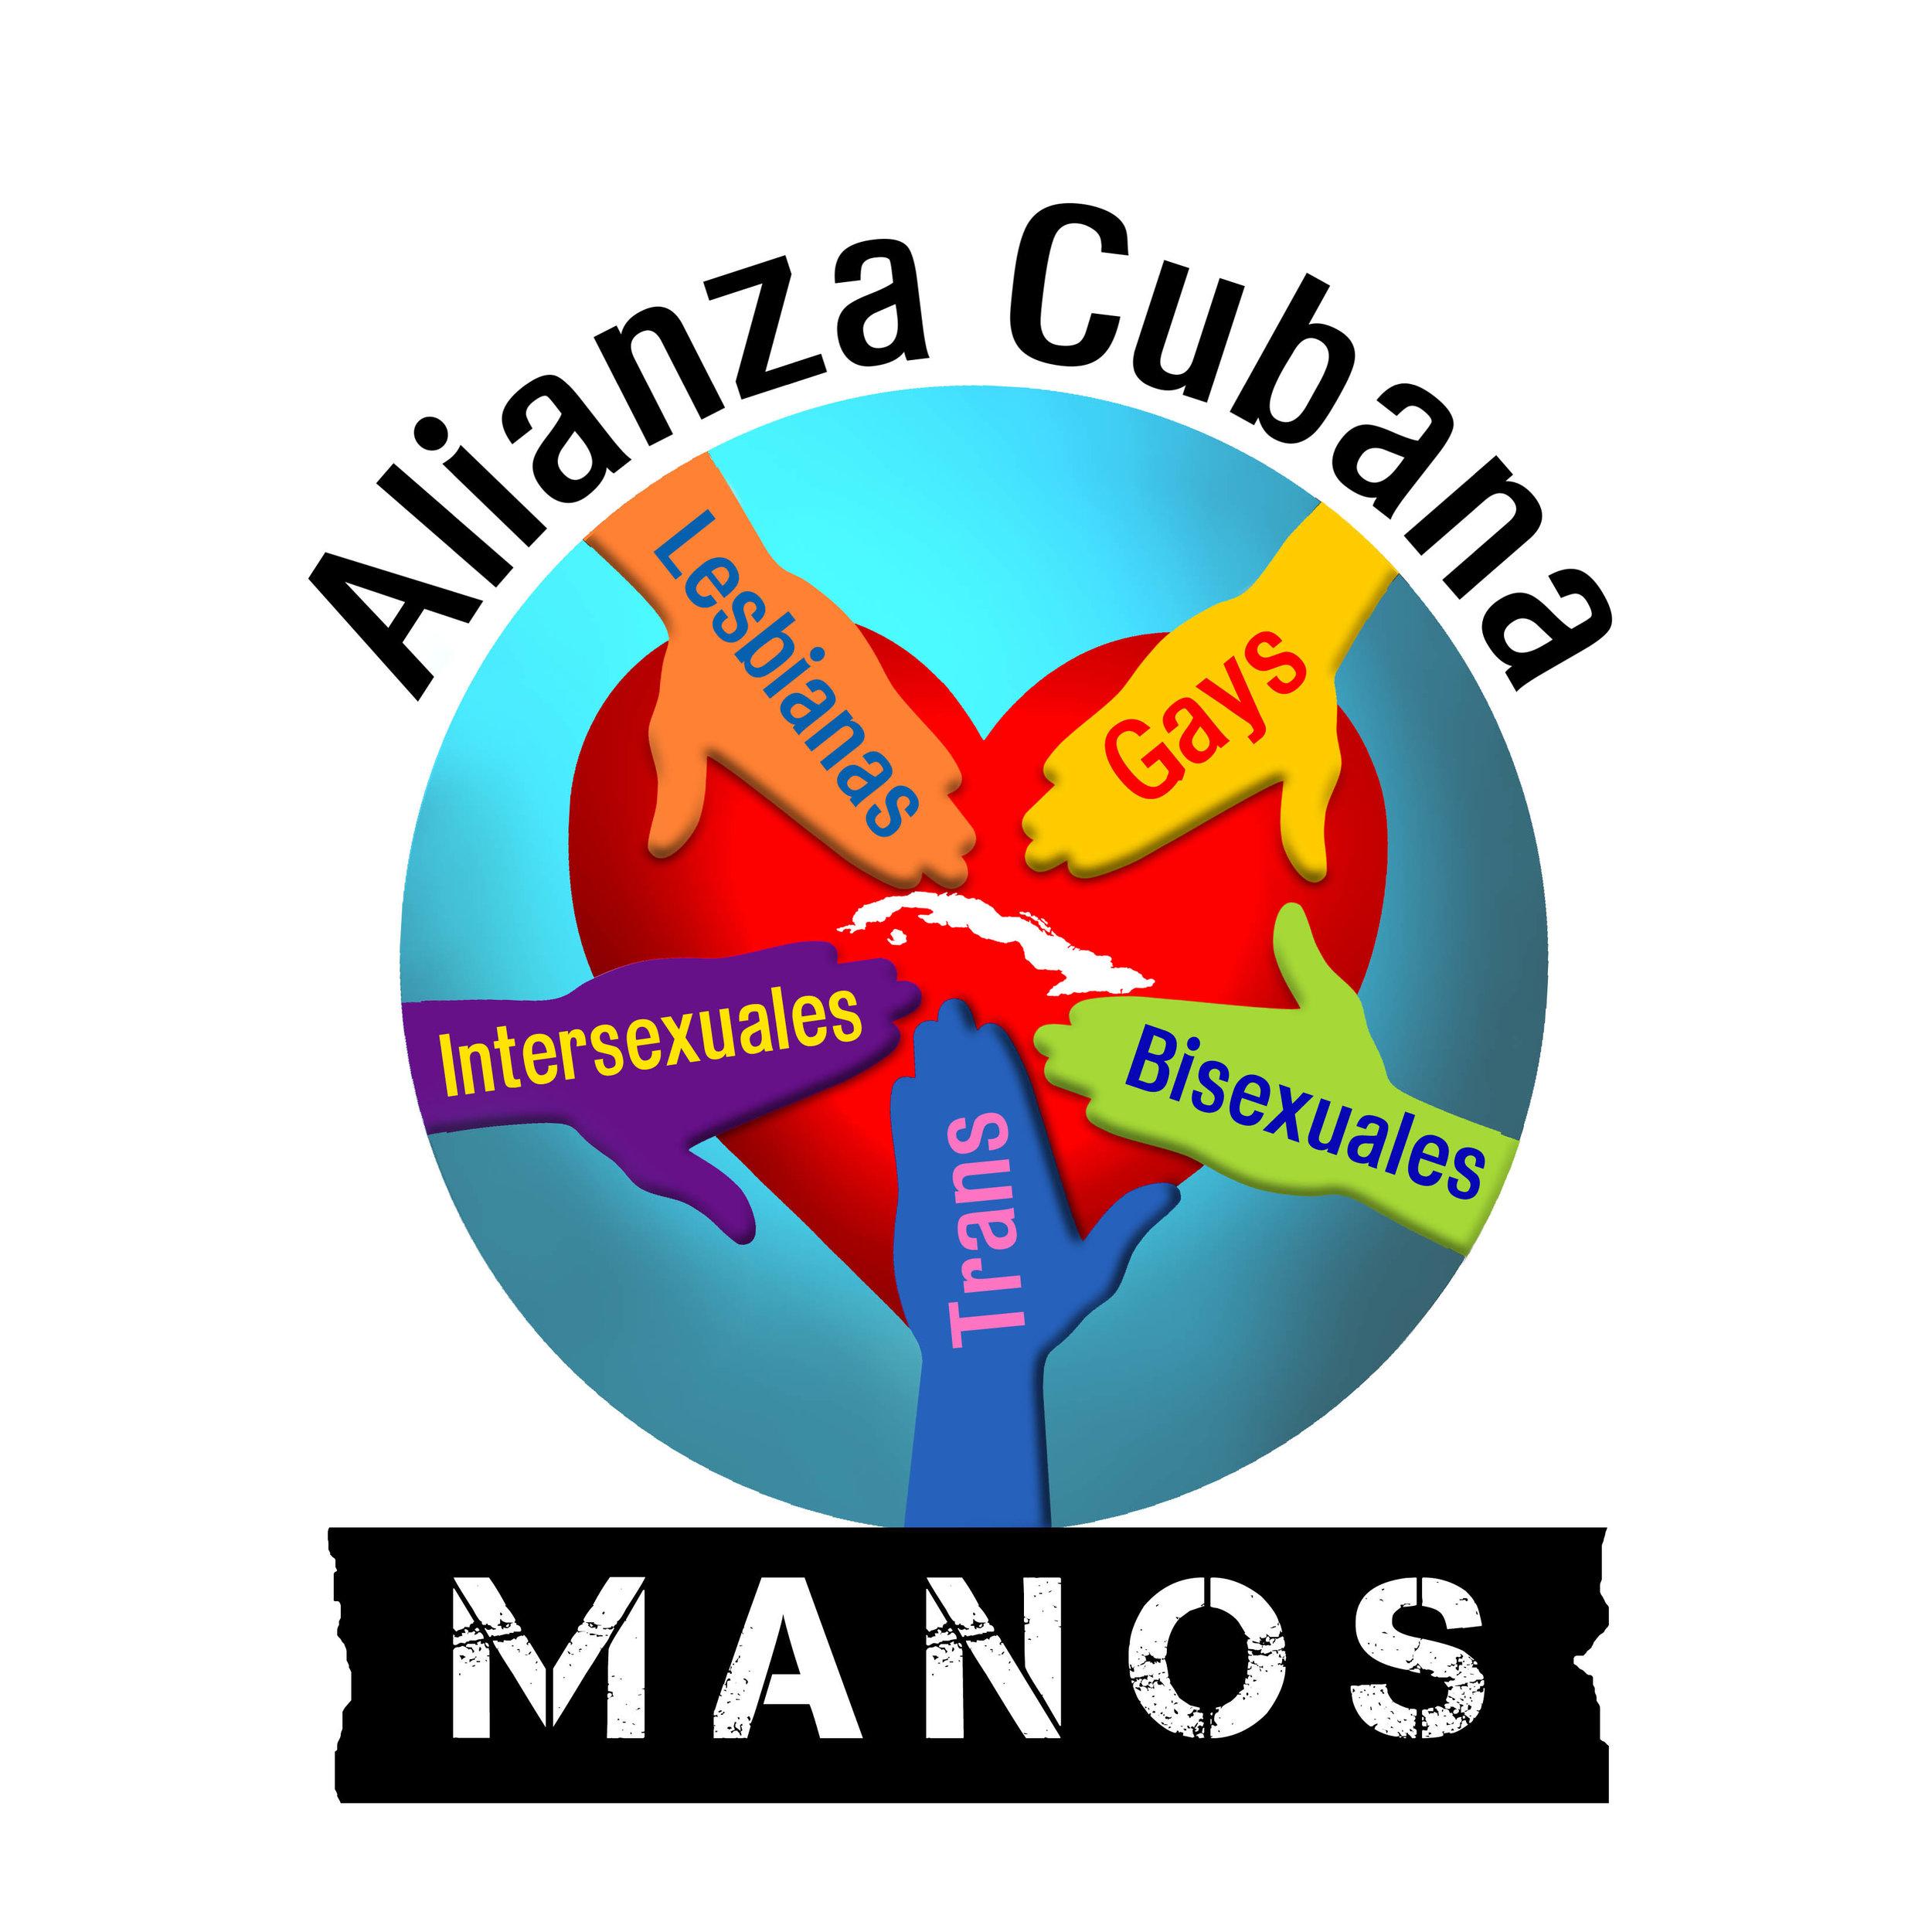 alianza-cubana-manos-2014-large.jpg